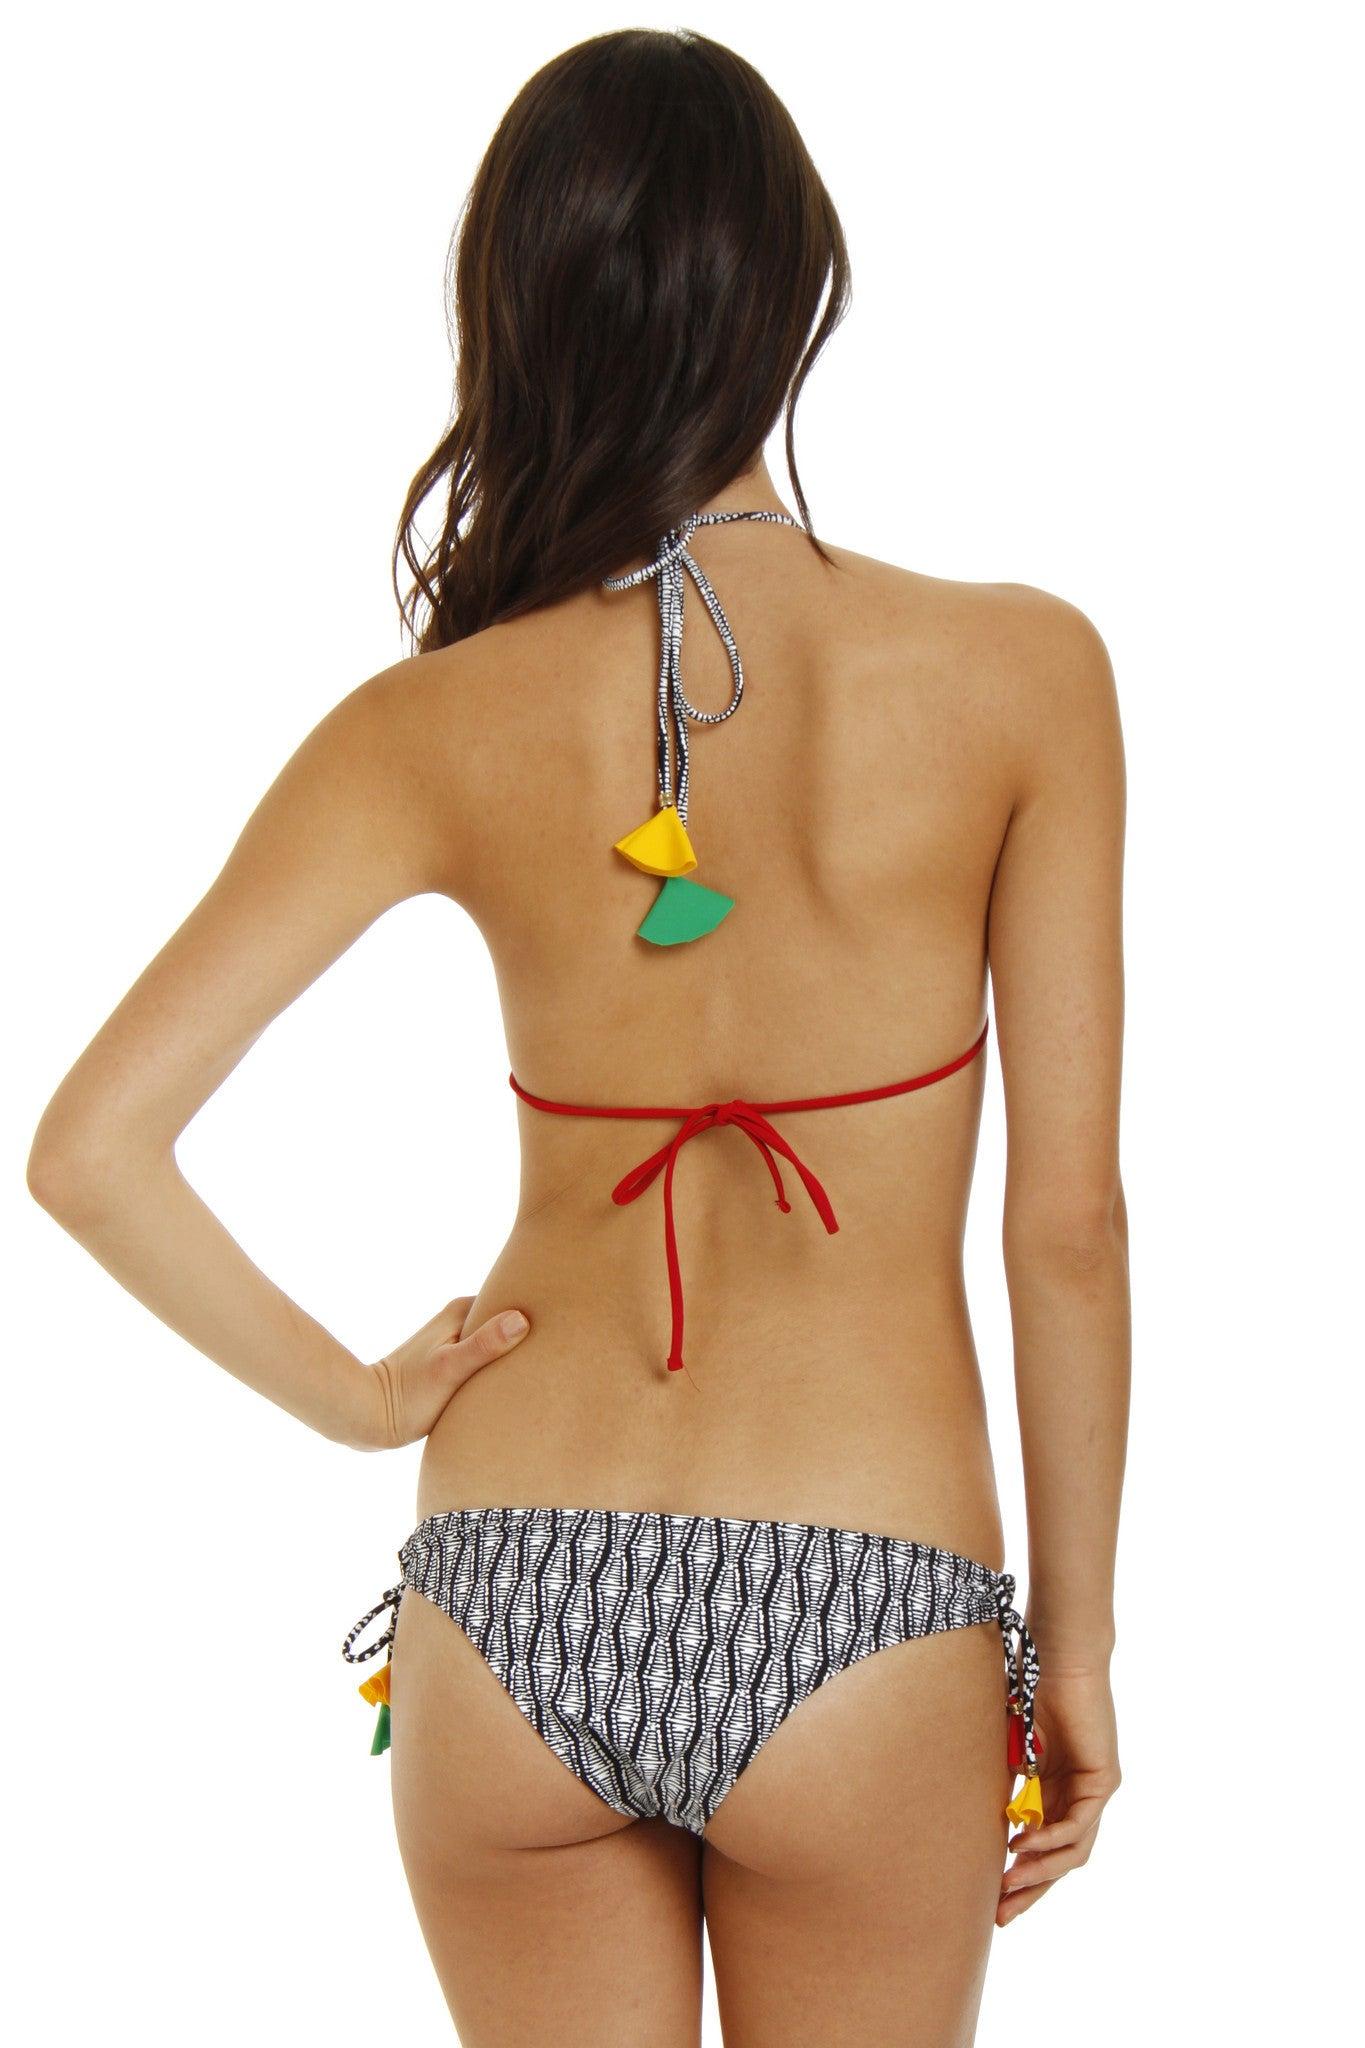 RAISINS Kauai Tassel Tie Side Bikini Bottom - Black & White Geometric Print Bikini Bottom | Black & White Geometric Print| Raisins Kauai Tassel Tie Side Bikini Bottom - Black & White Geometric Print Side Ties Adjustable Fit. Patterned Lining. Cheeky Rear Coverage. Back View